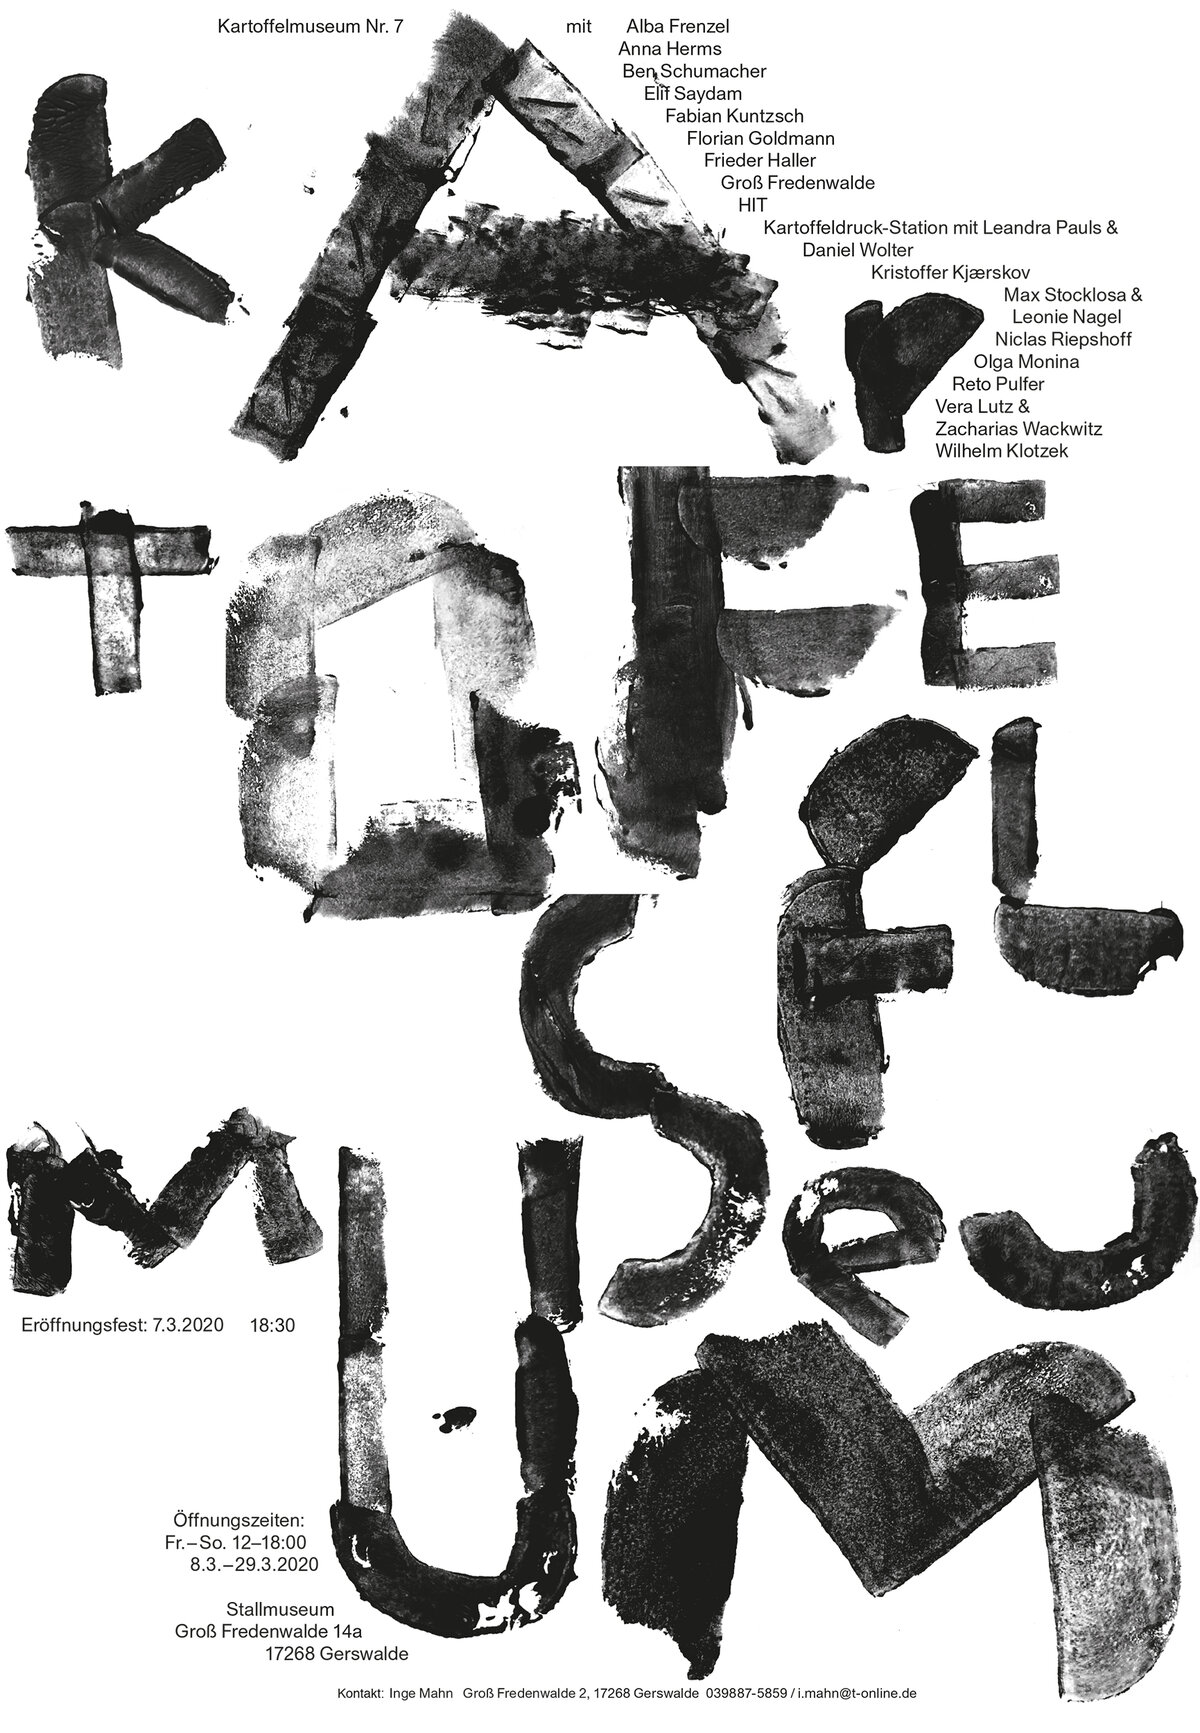 flyer_print-1-1200x1733-q85